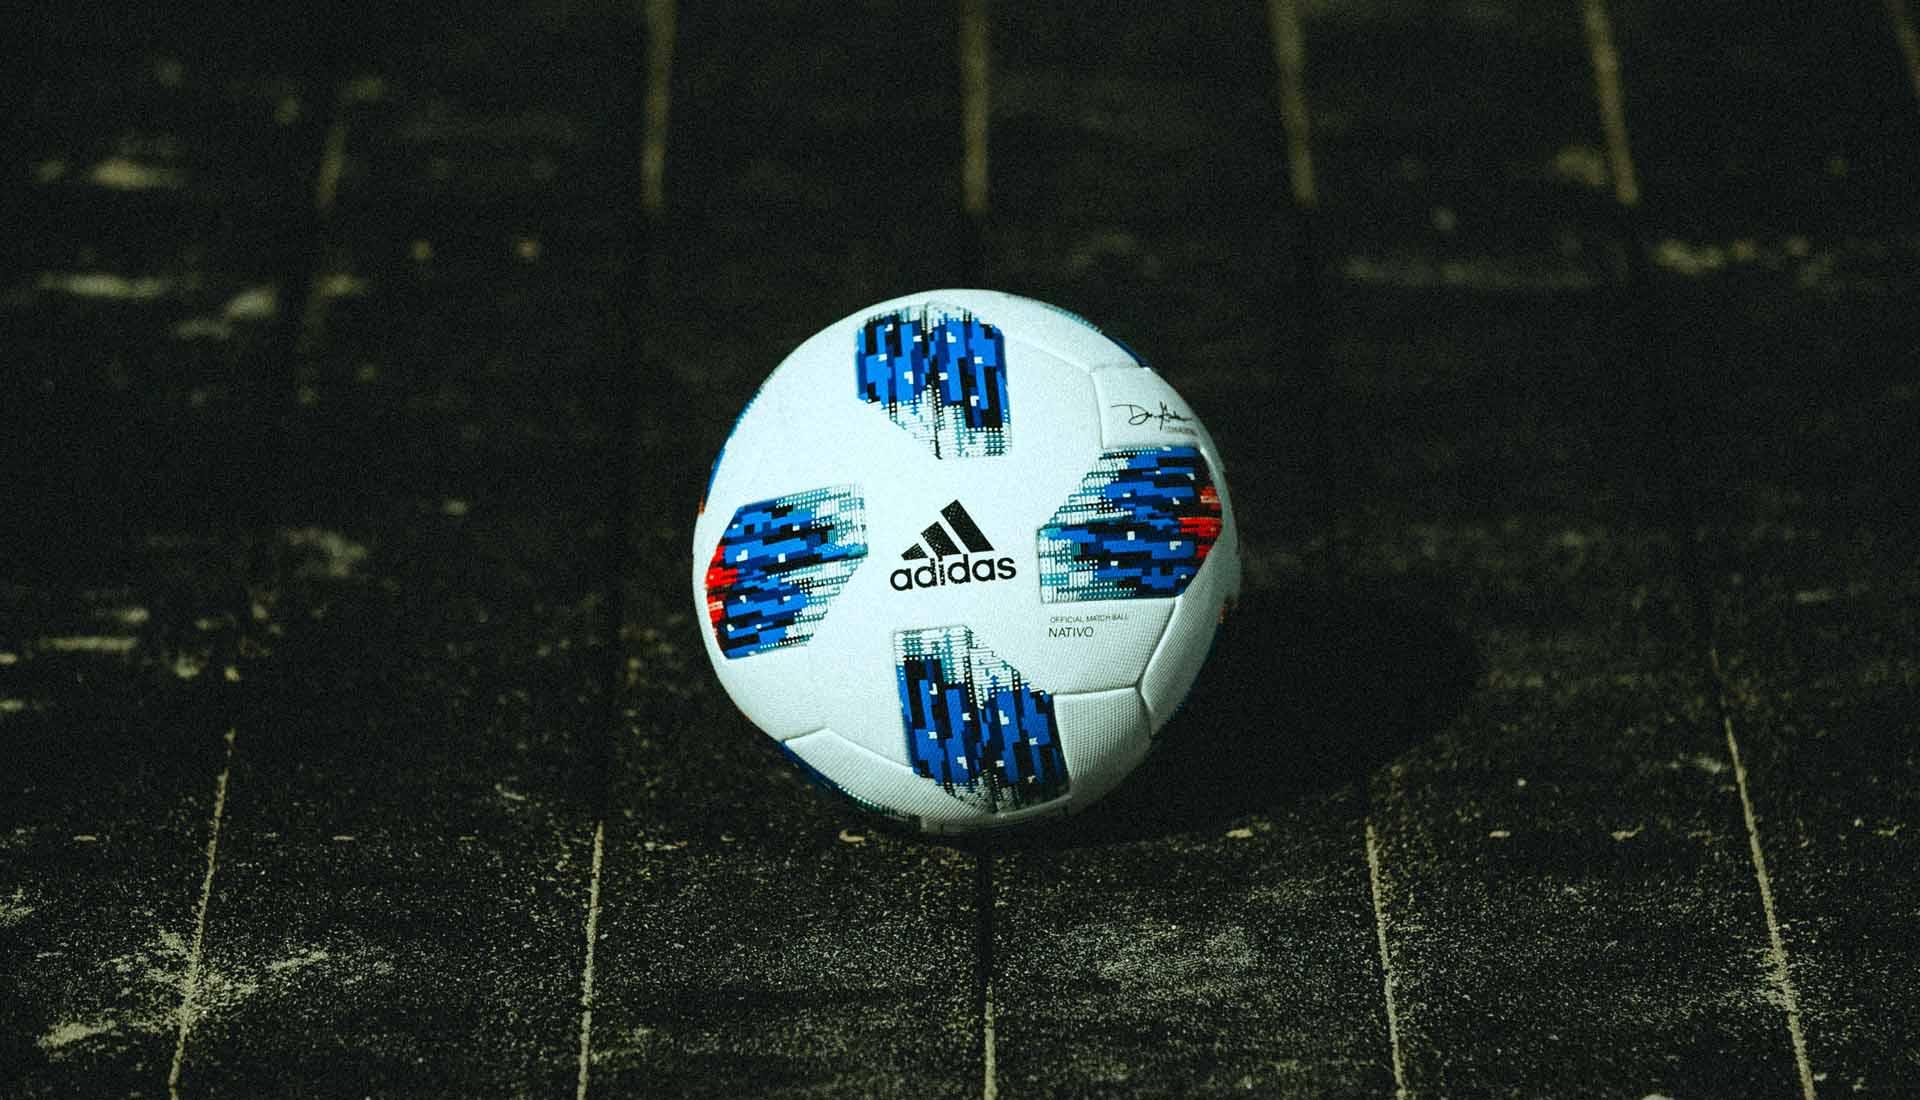 ballon-football-adidas-MLS-Nativo-2018-img4